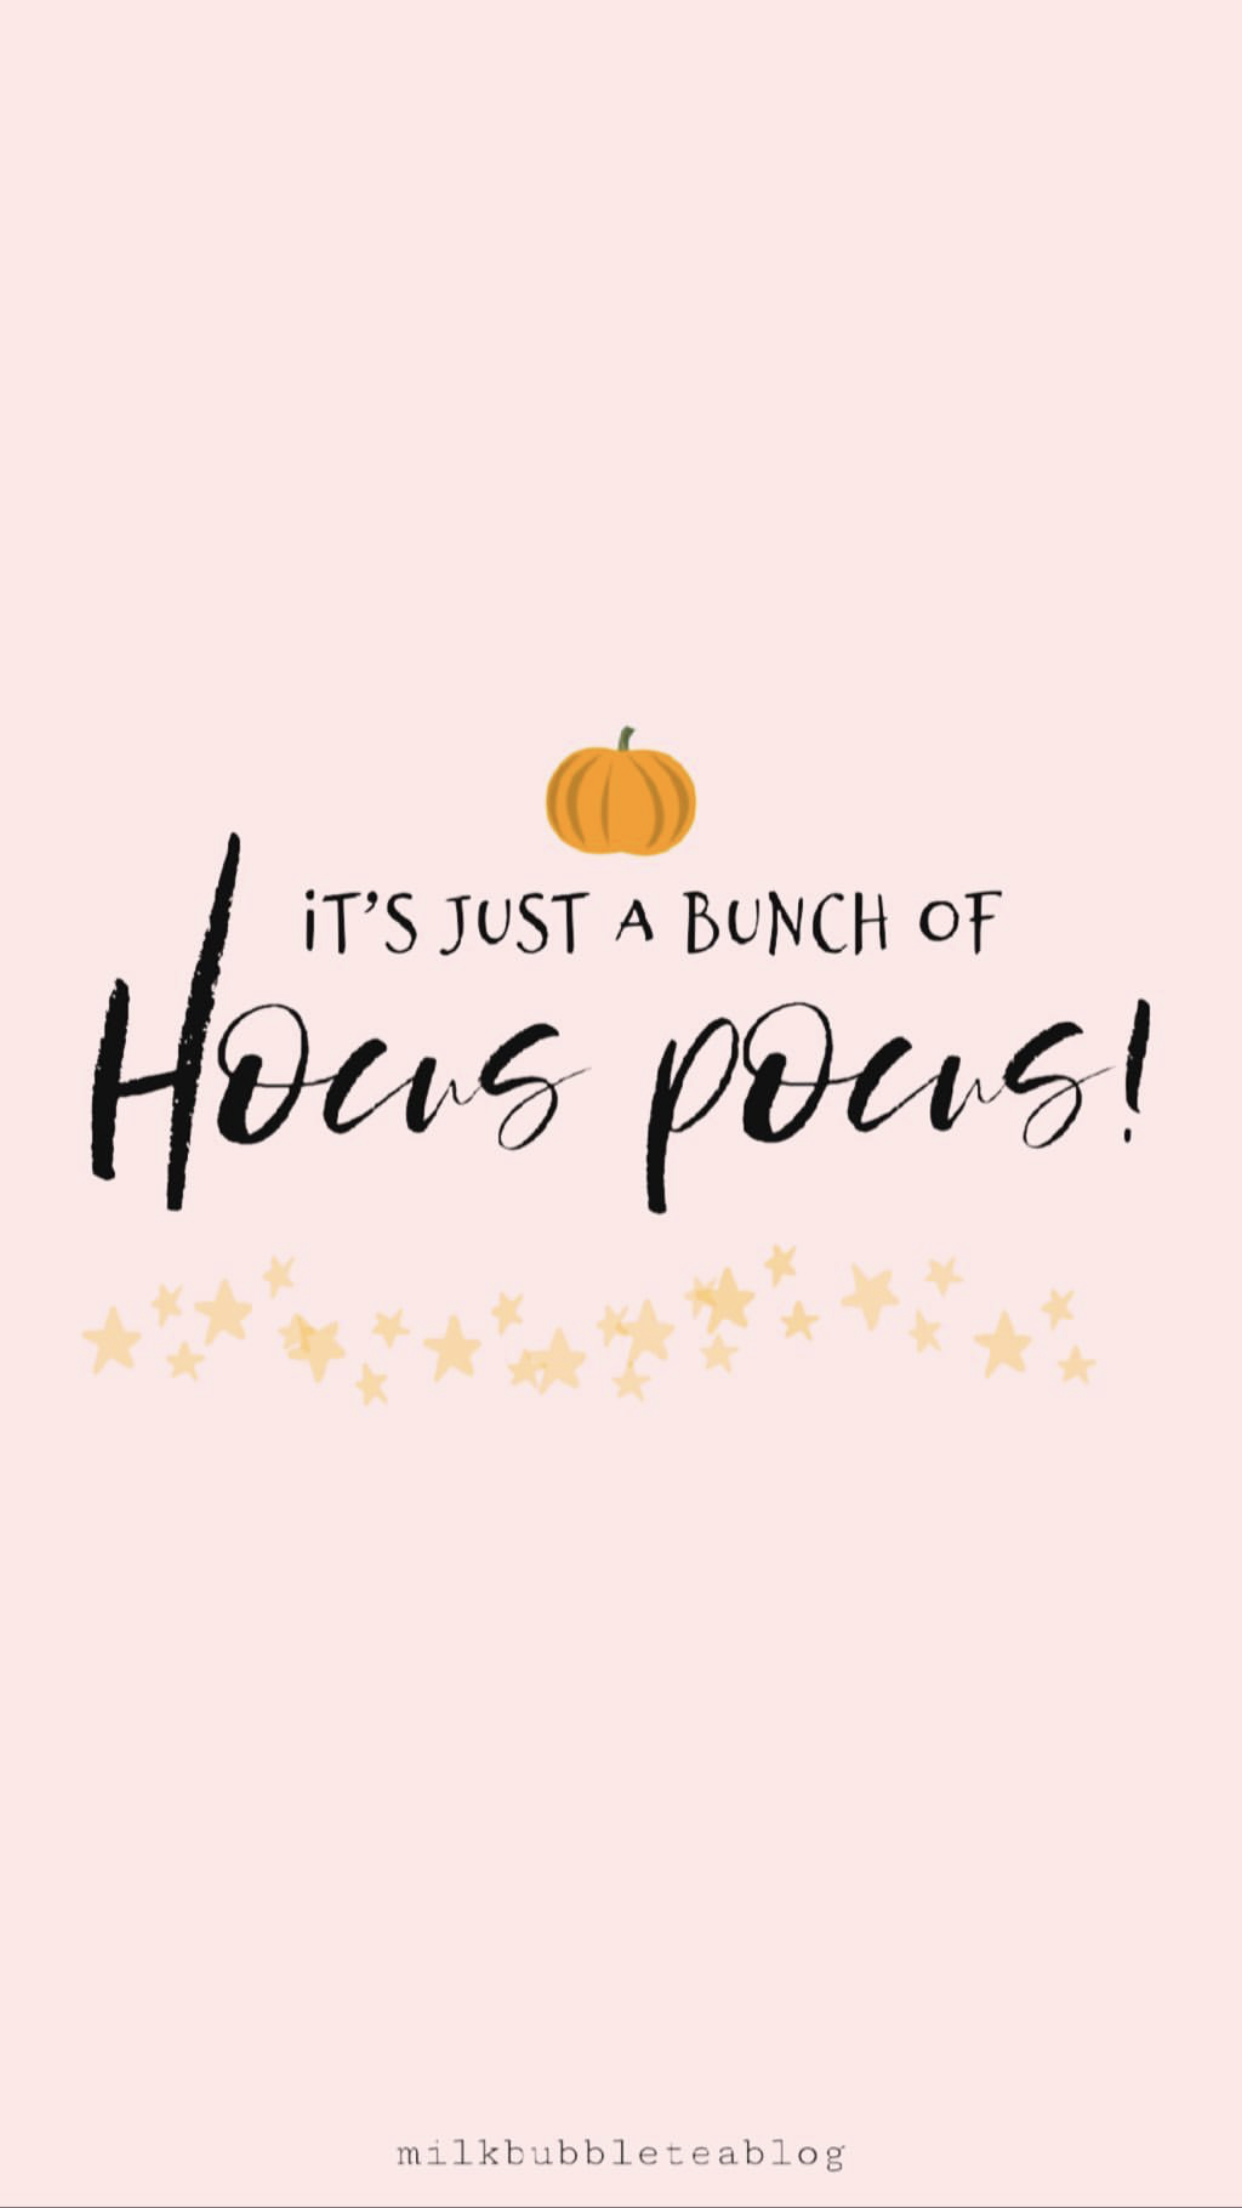 Pin By Olivia Sanchez On Fall For Fall Halloween Wallpaper Iphone Cute Fall Wallpaper Fall Wallpaper